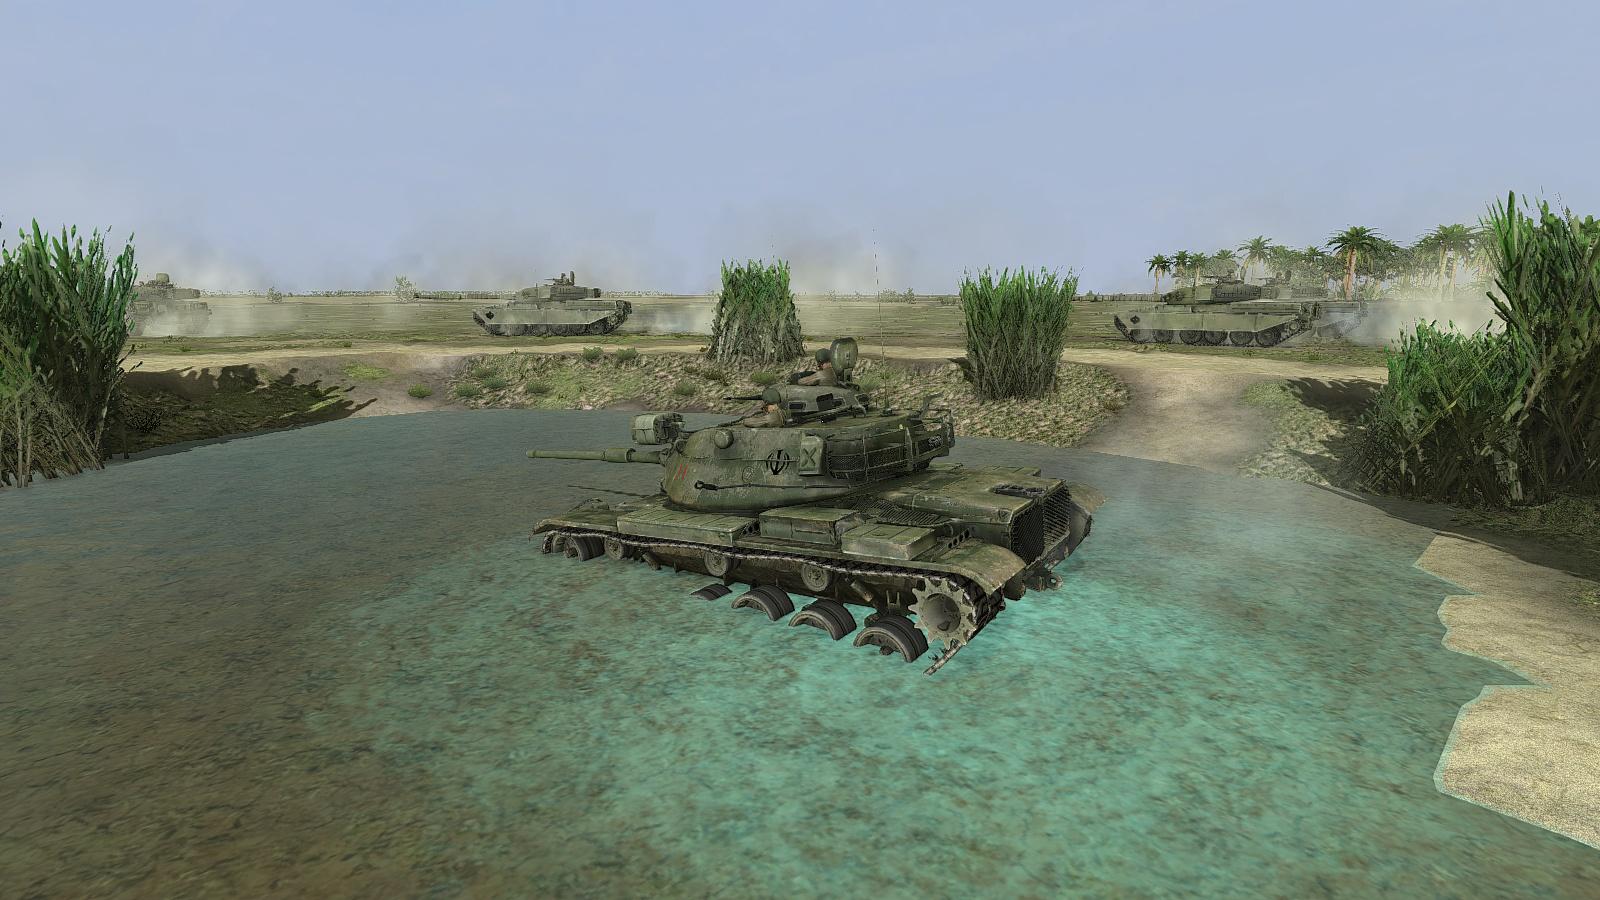 Steel Armor Blaze of War - M60 & Chieftains